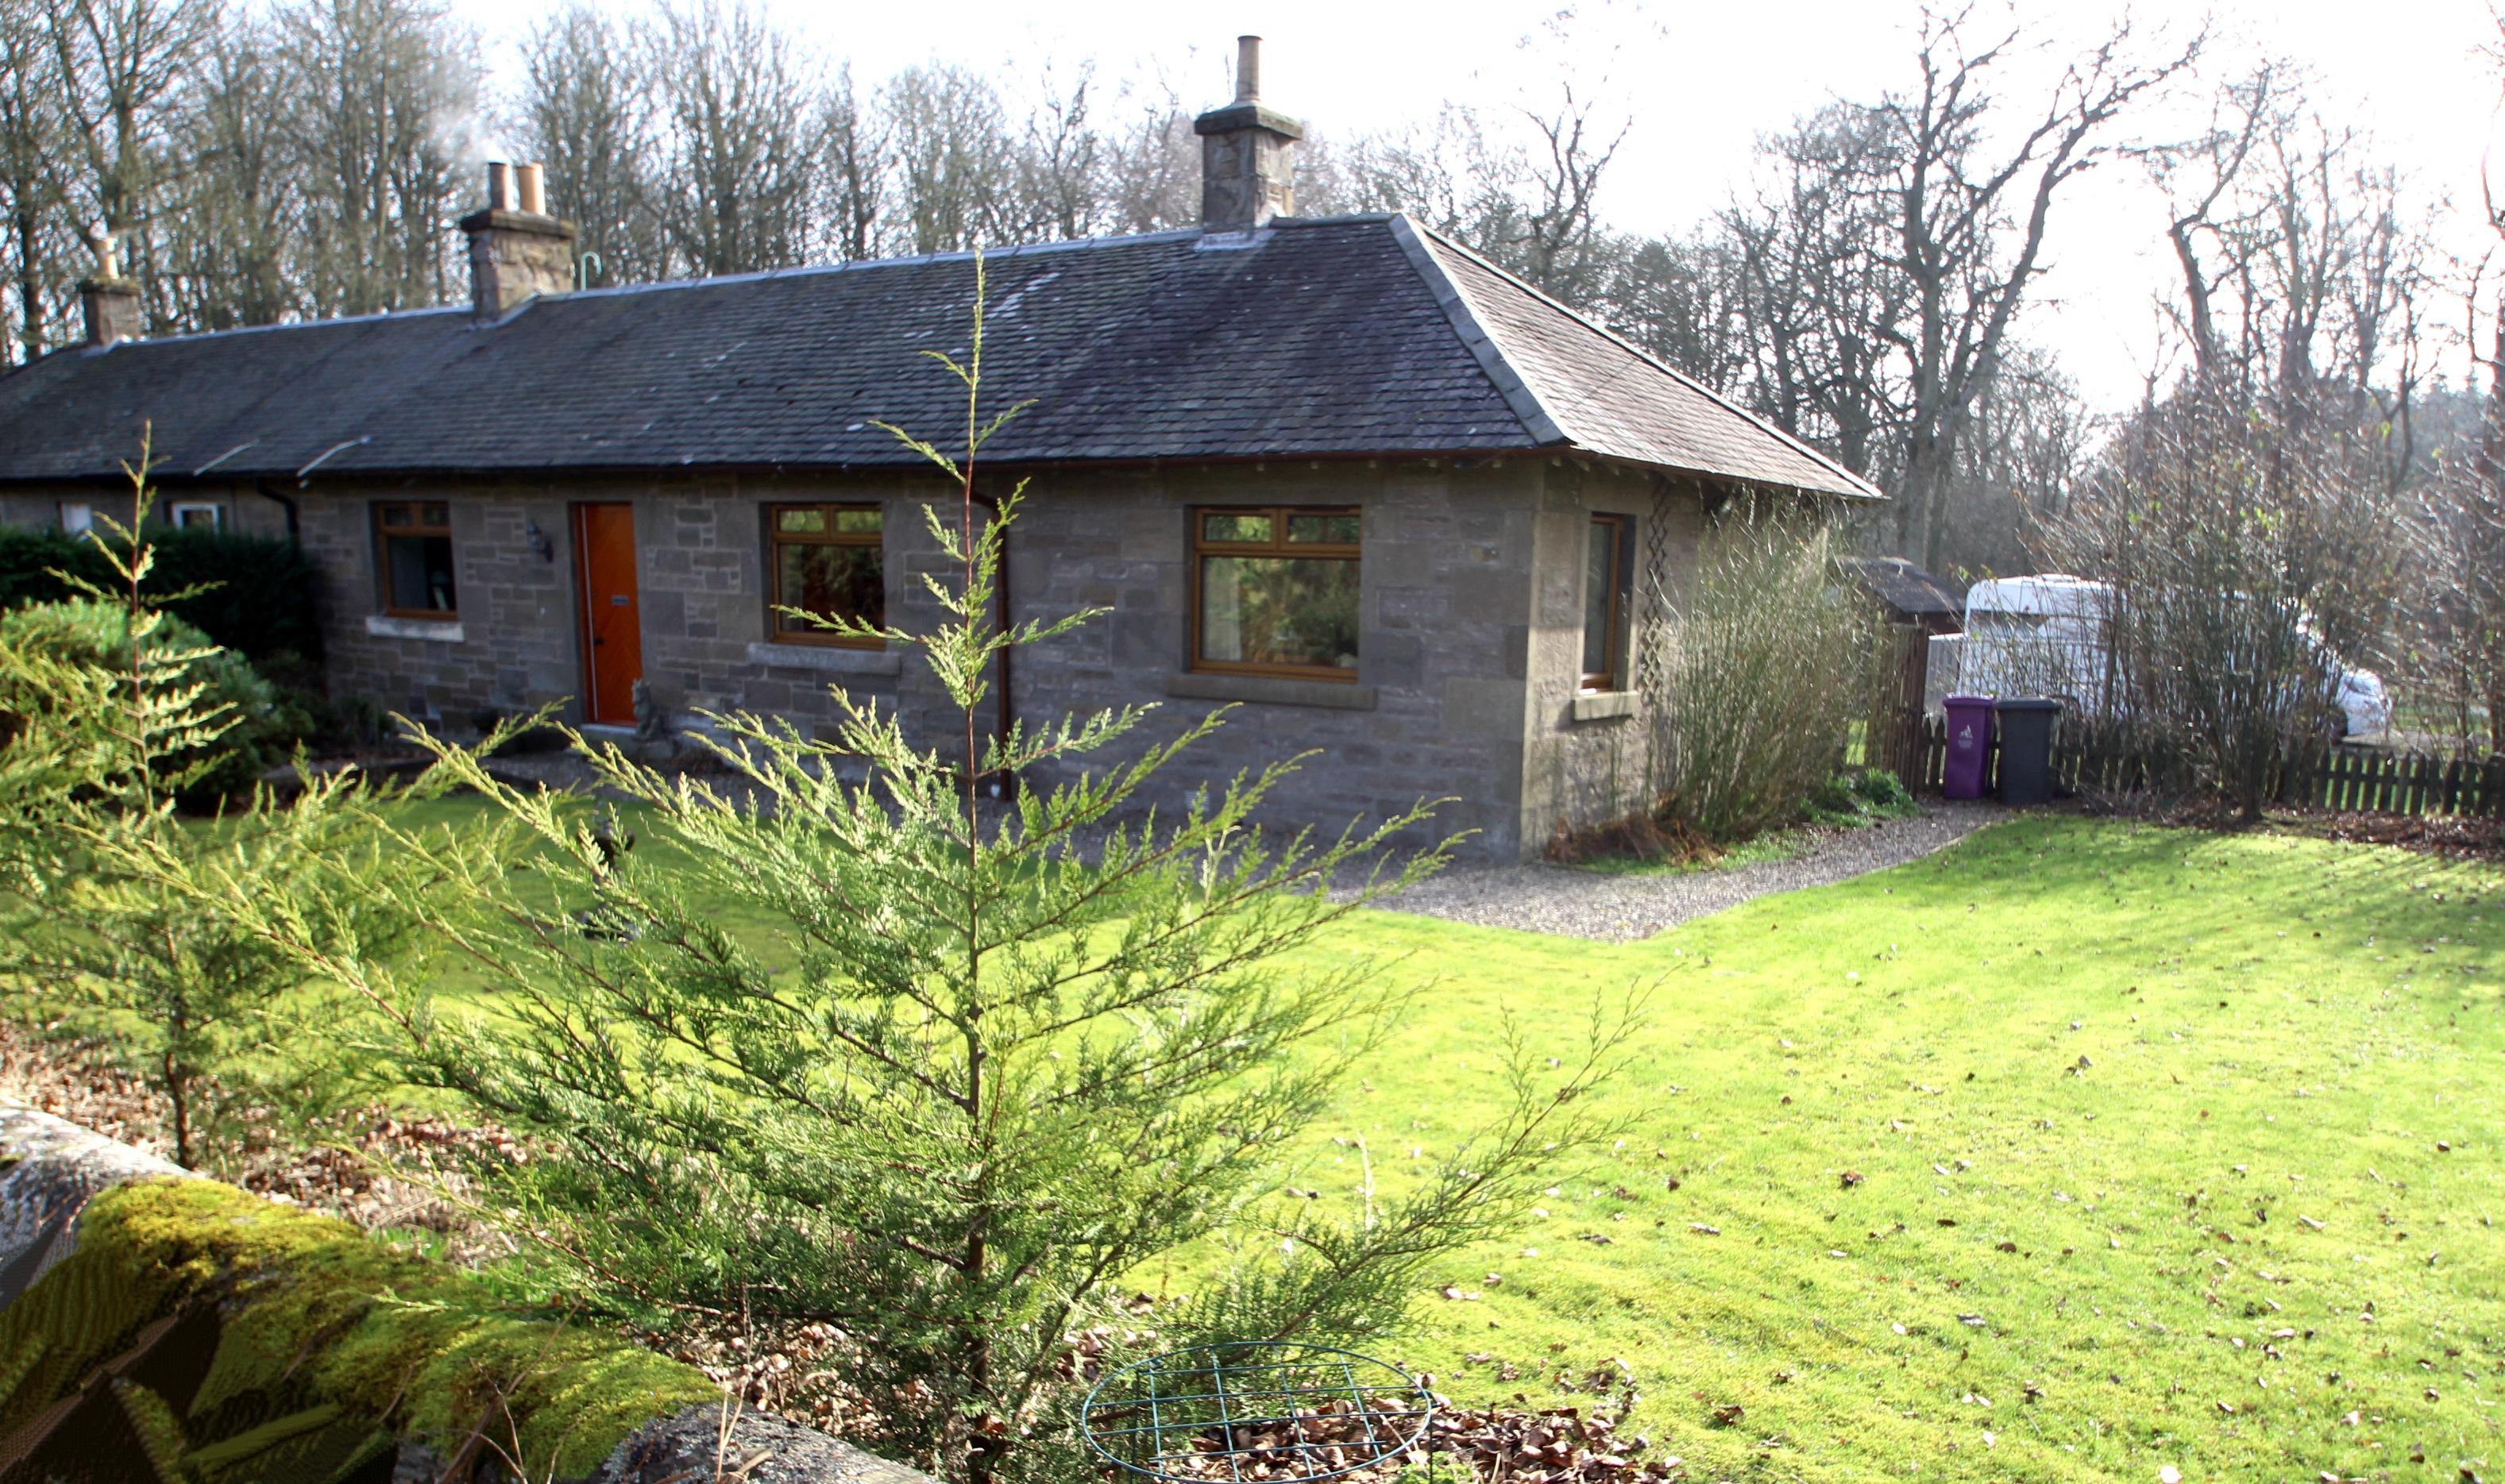 Pathhead Cottage West, Panmure Estate, Carnoustie, Angus, DD7 6LW